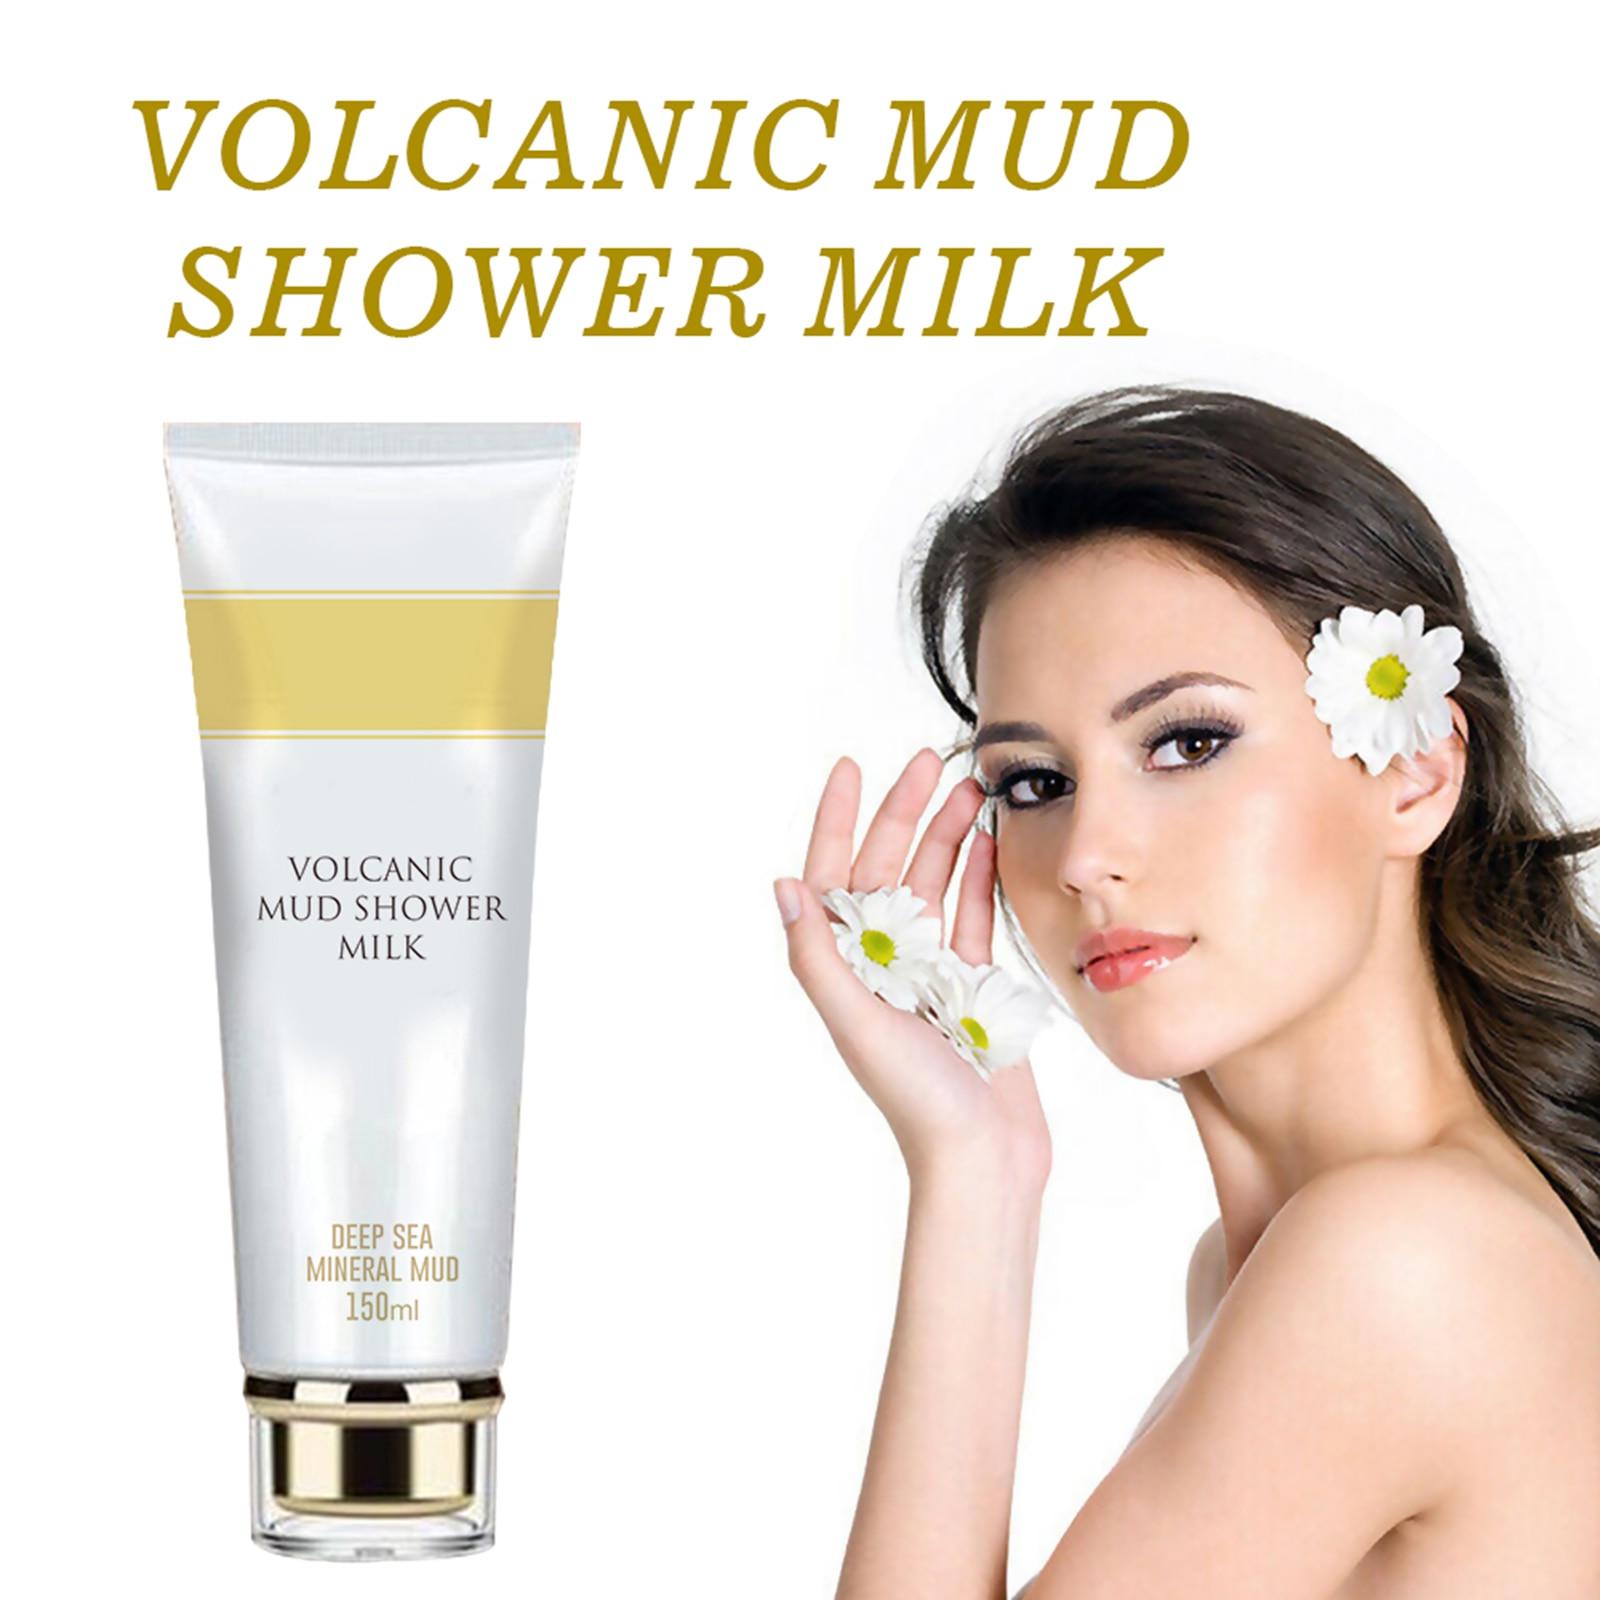 Whitening Volcanic Mud Bath Milk Cream Body Wash Healthy Formulas Wash Deep Clean Body Lotion For Dark Spots Women Men--150ml